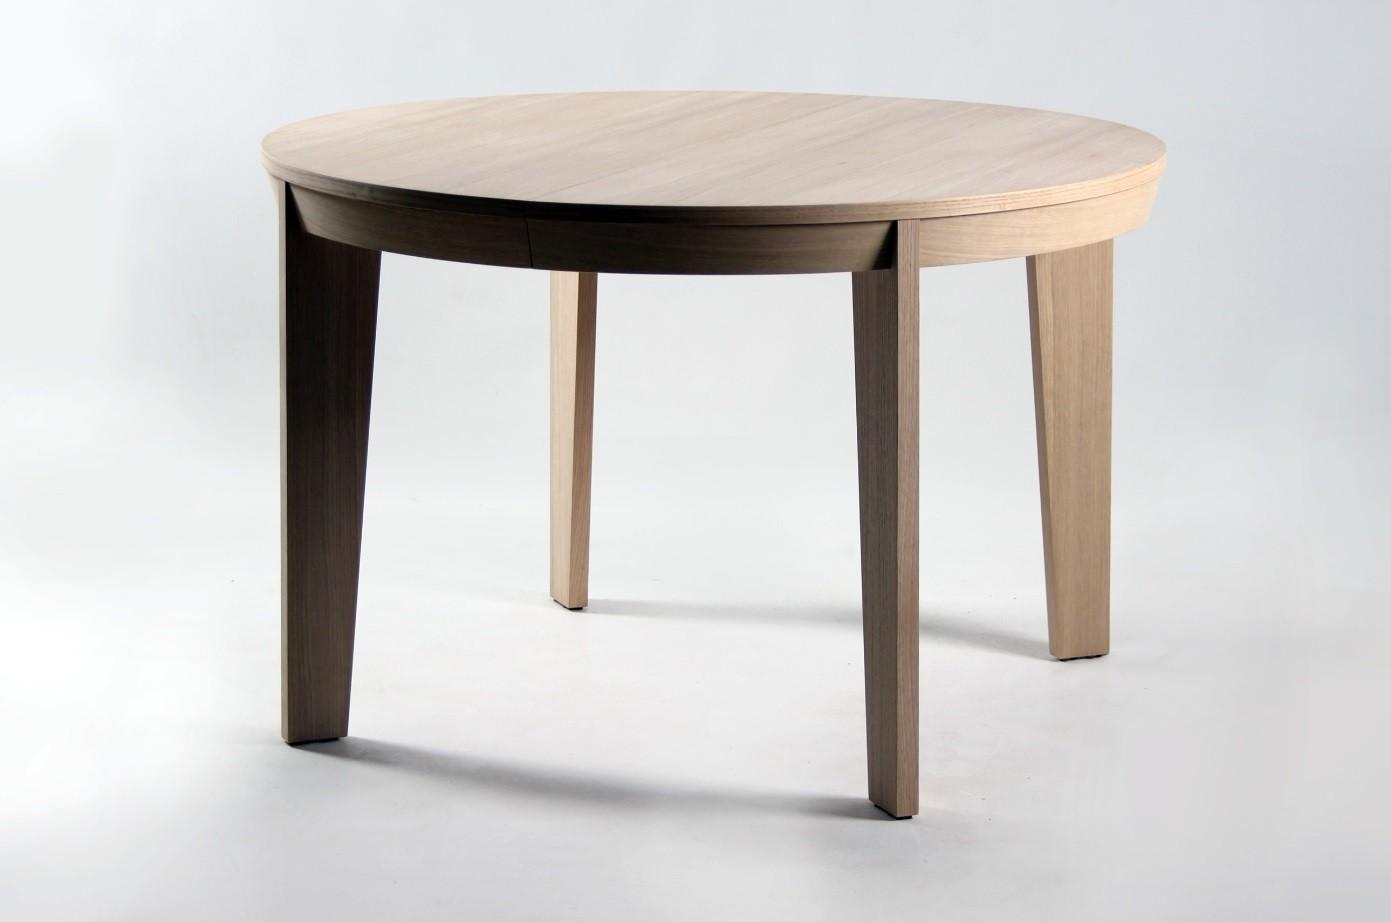 table ronde en bois avec rallonge